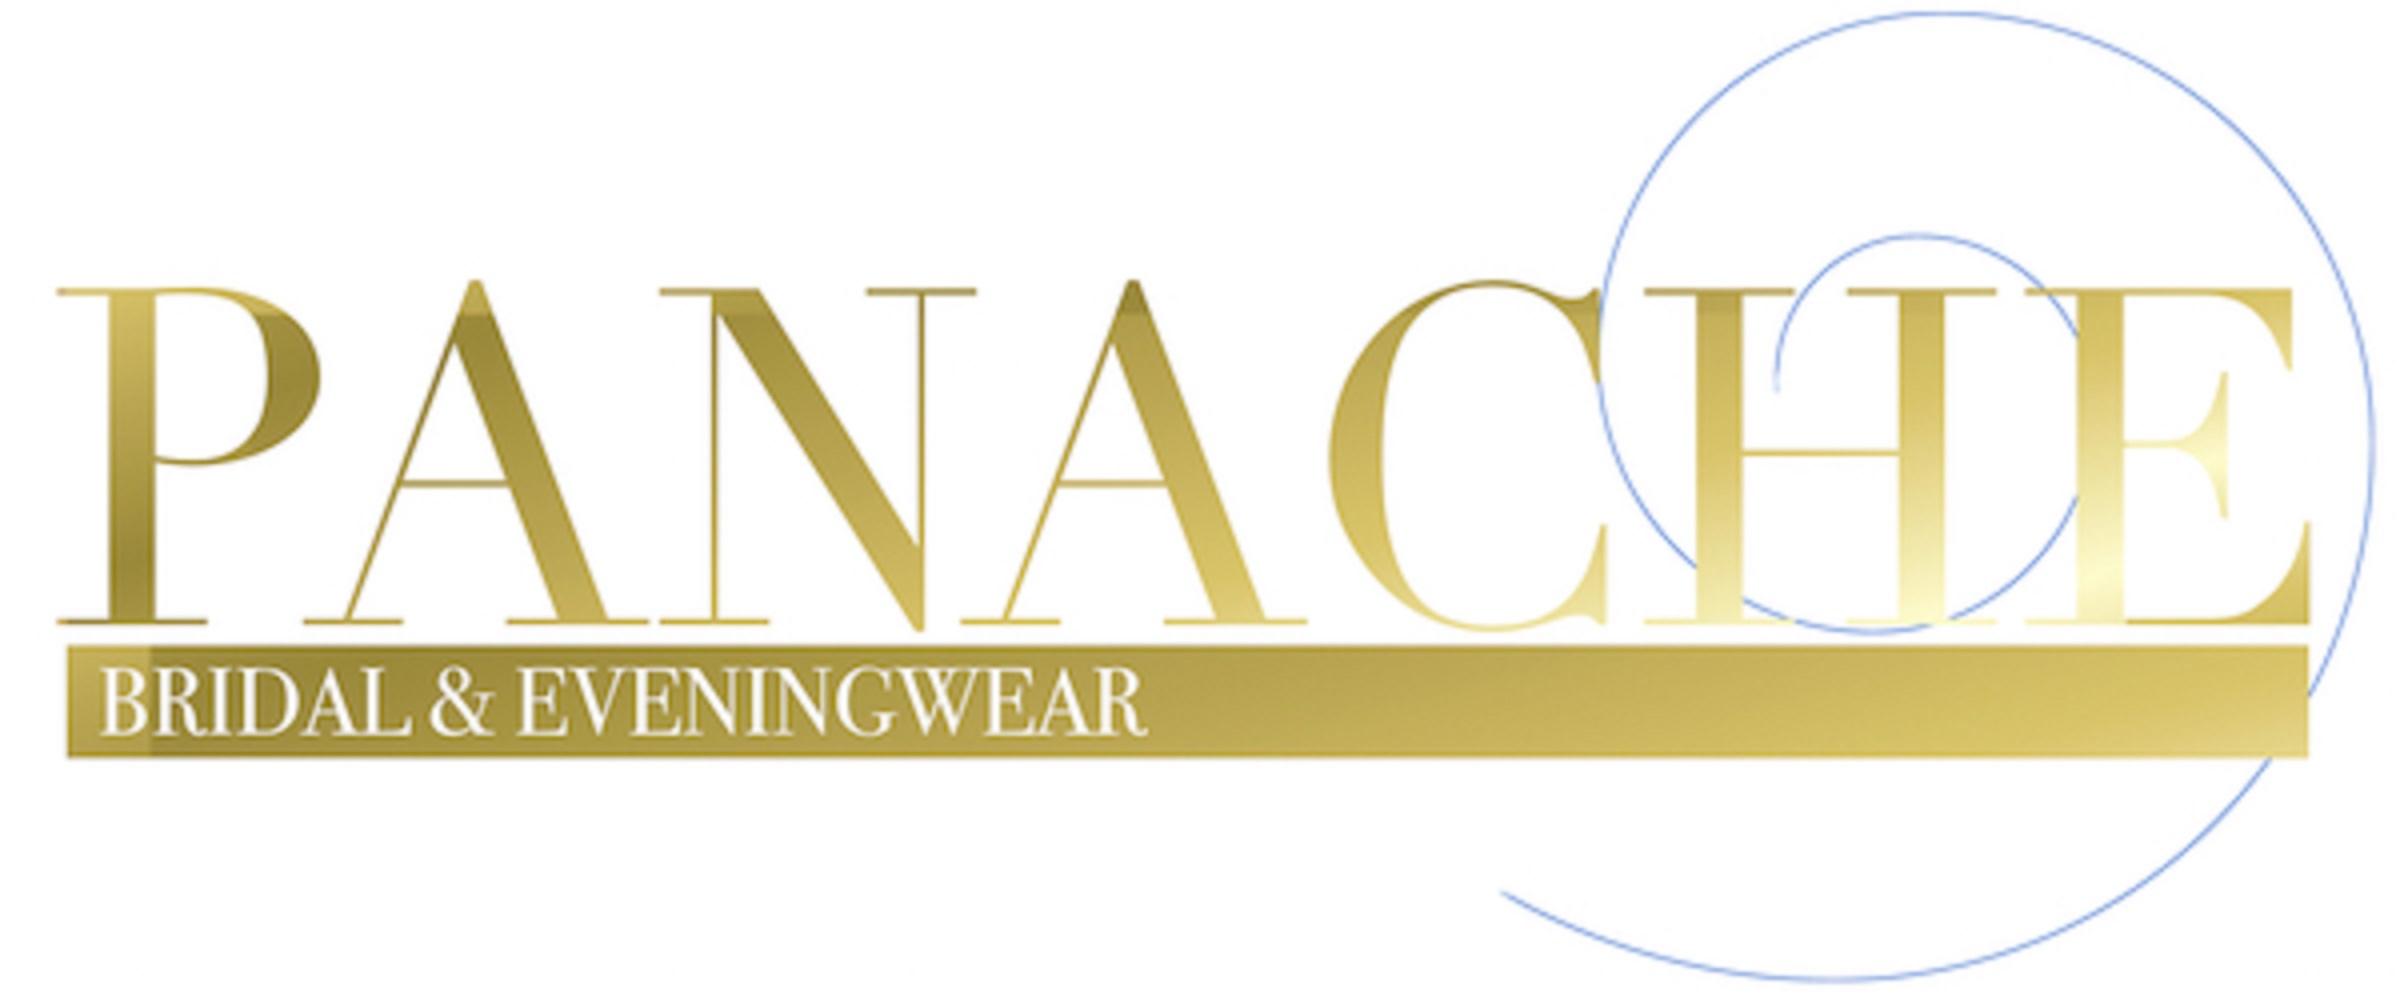 panache logo real500.jpg